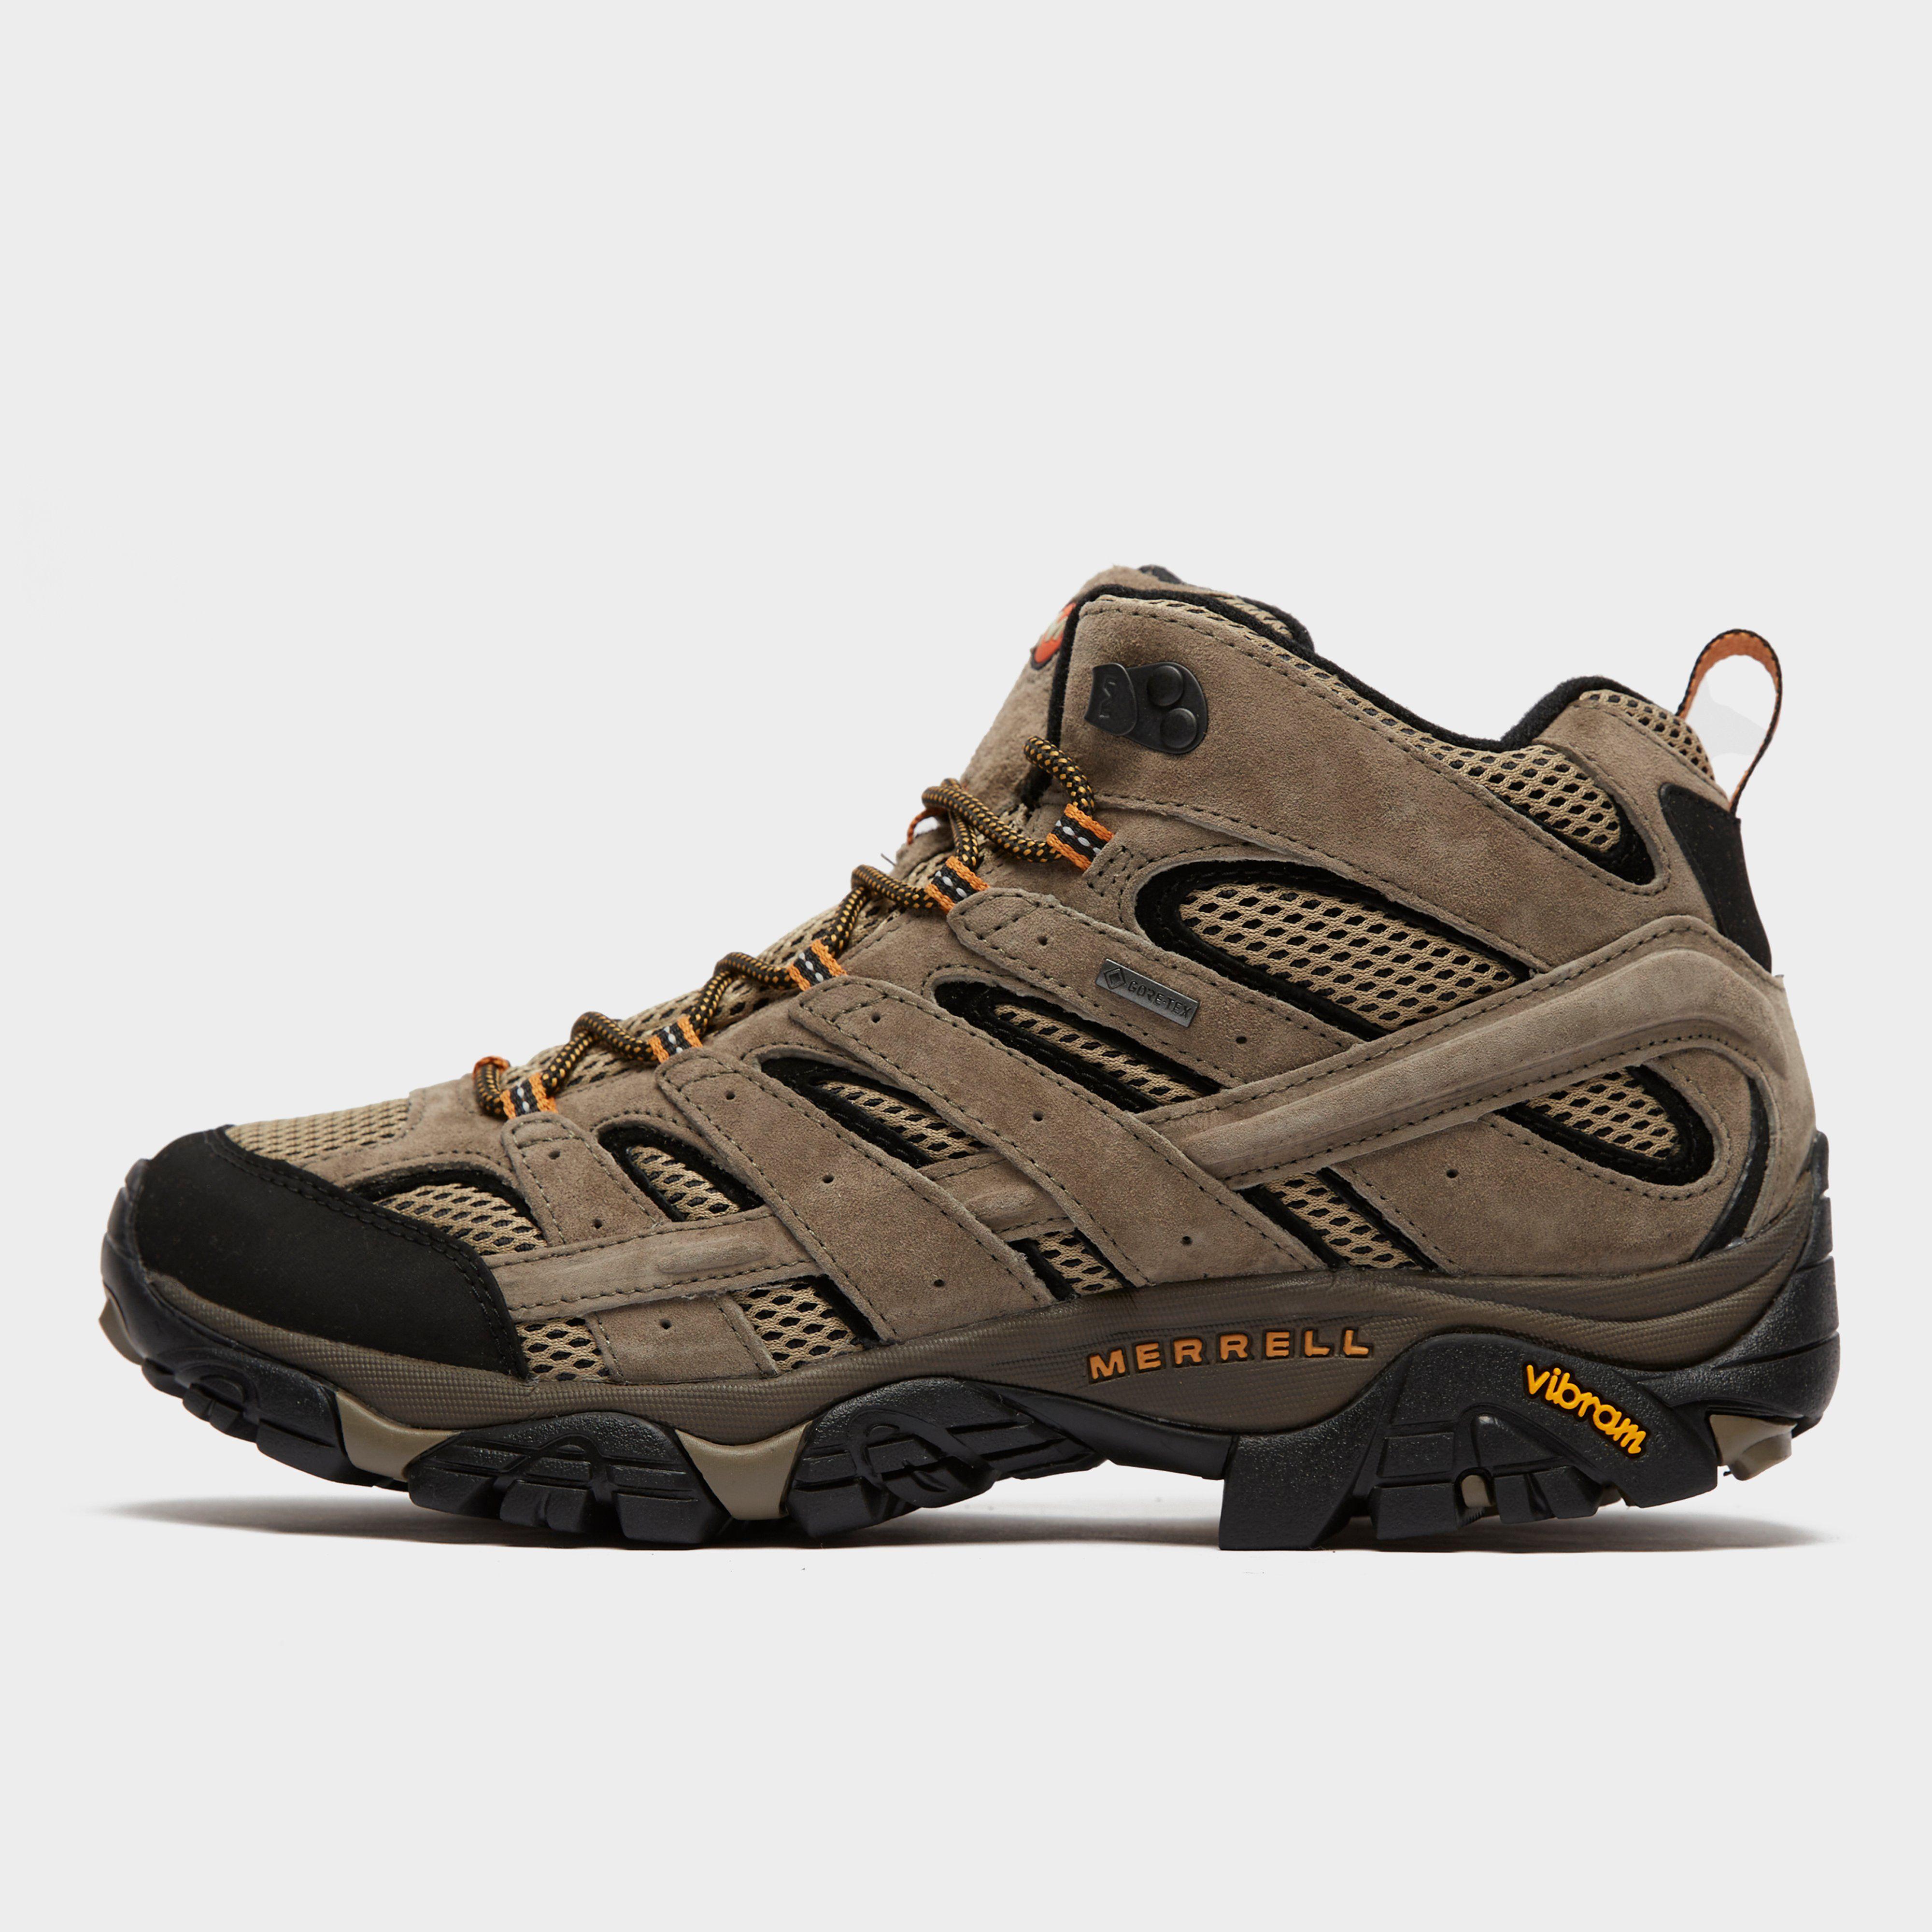 MERRELL Men's Moab 2 Mid GORE-TEX® Walking Boot